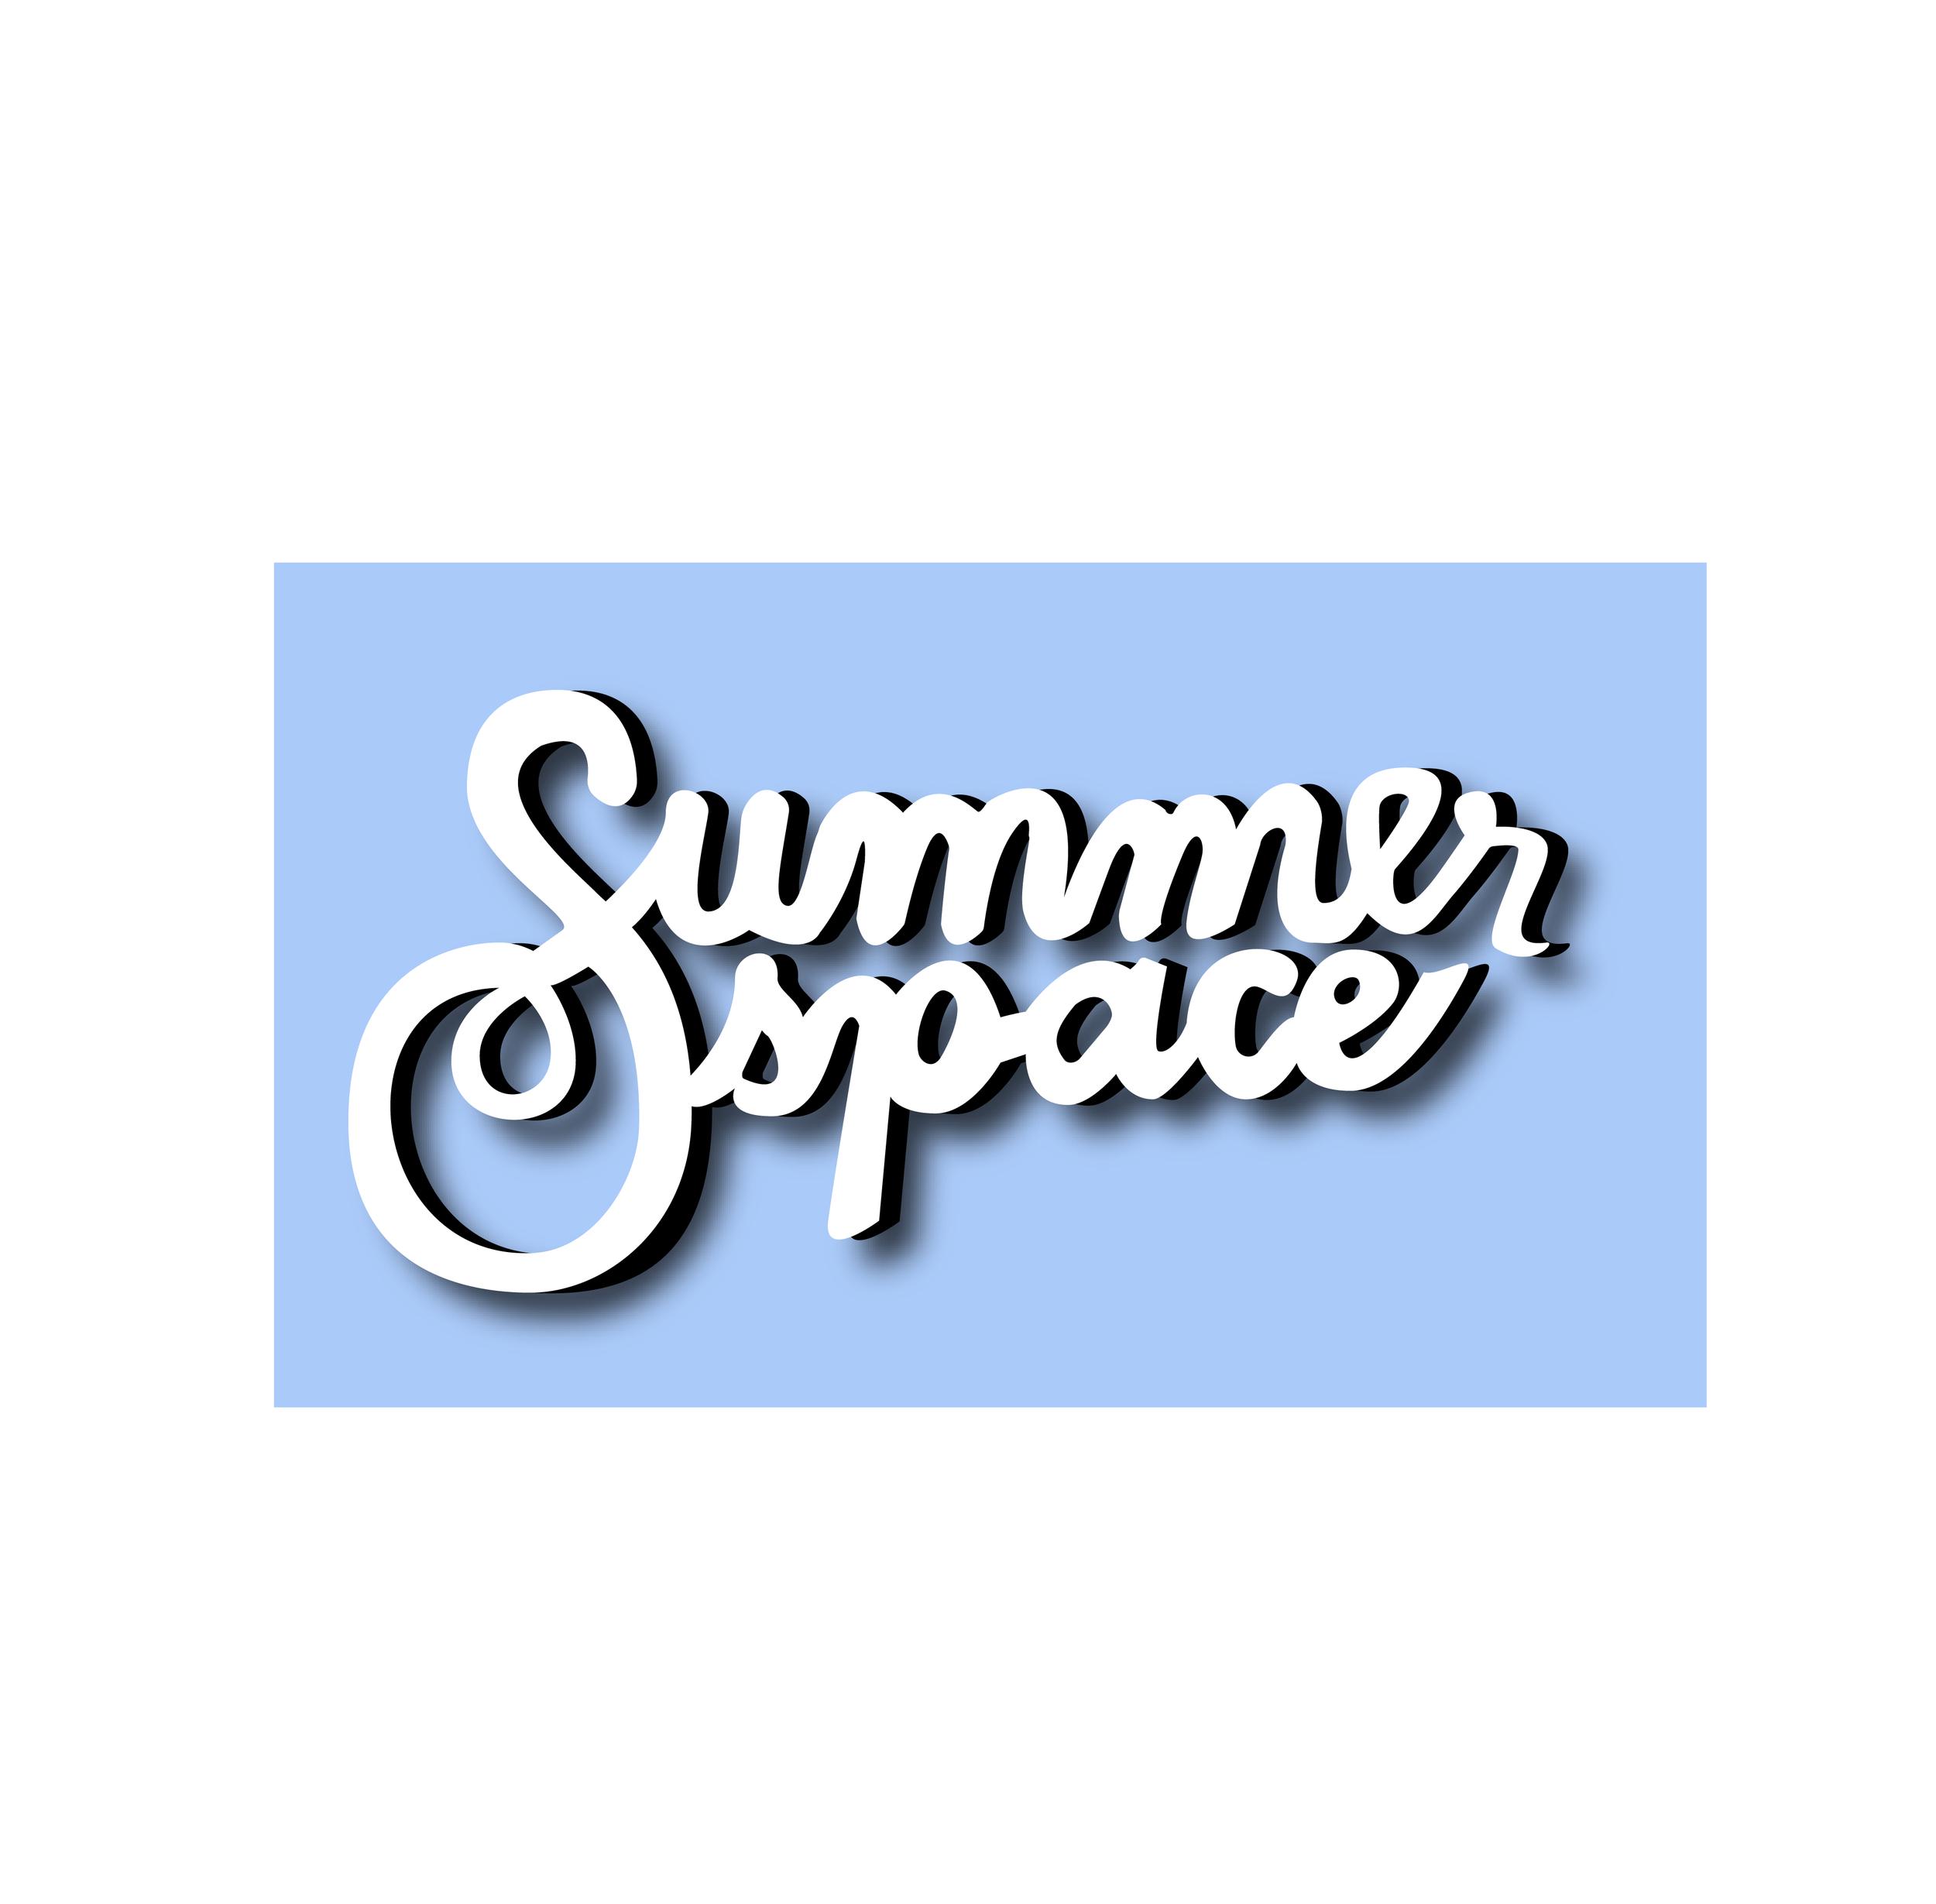 SS_logoprocess-08.png